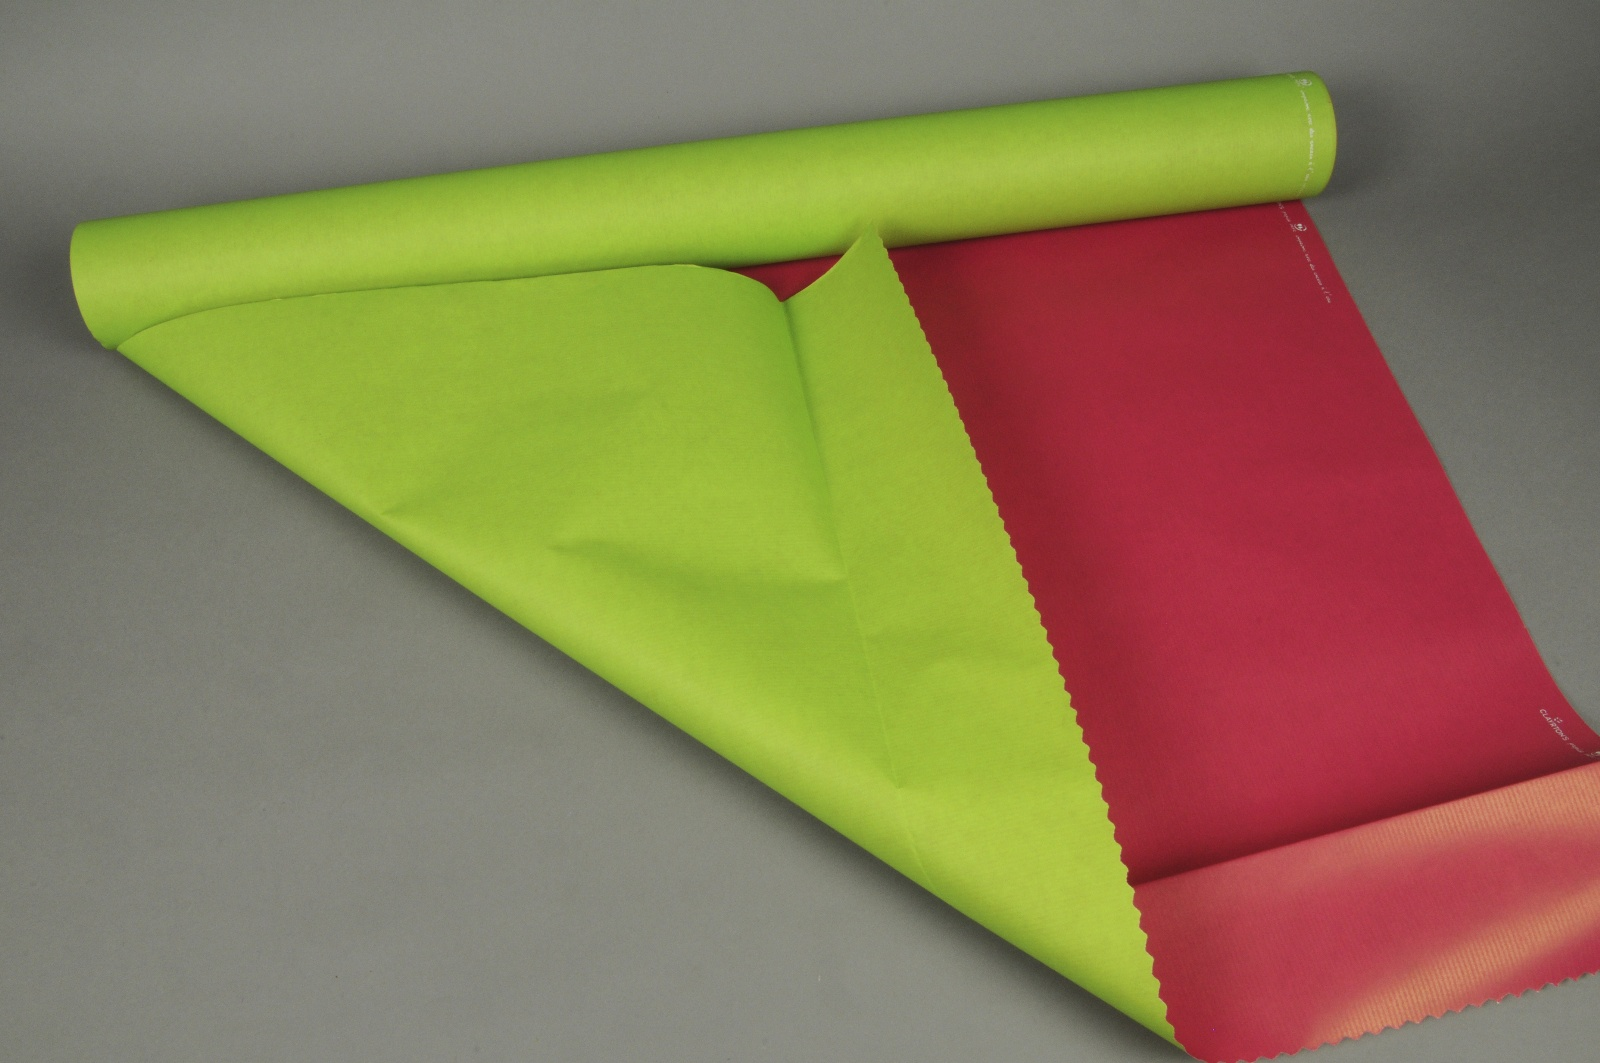 A127QX Rouleau de papier kraft vert pomme / fuchsia 80cmx50m